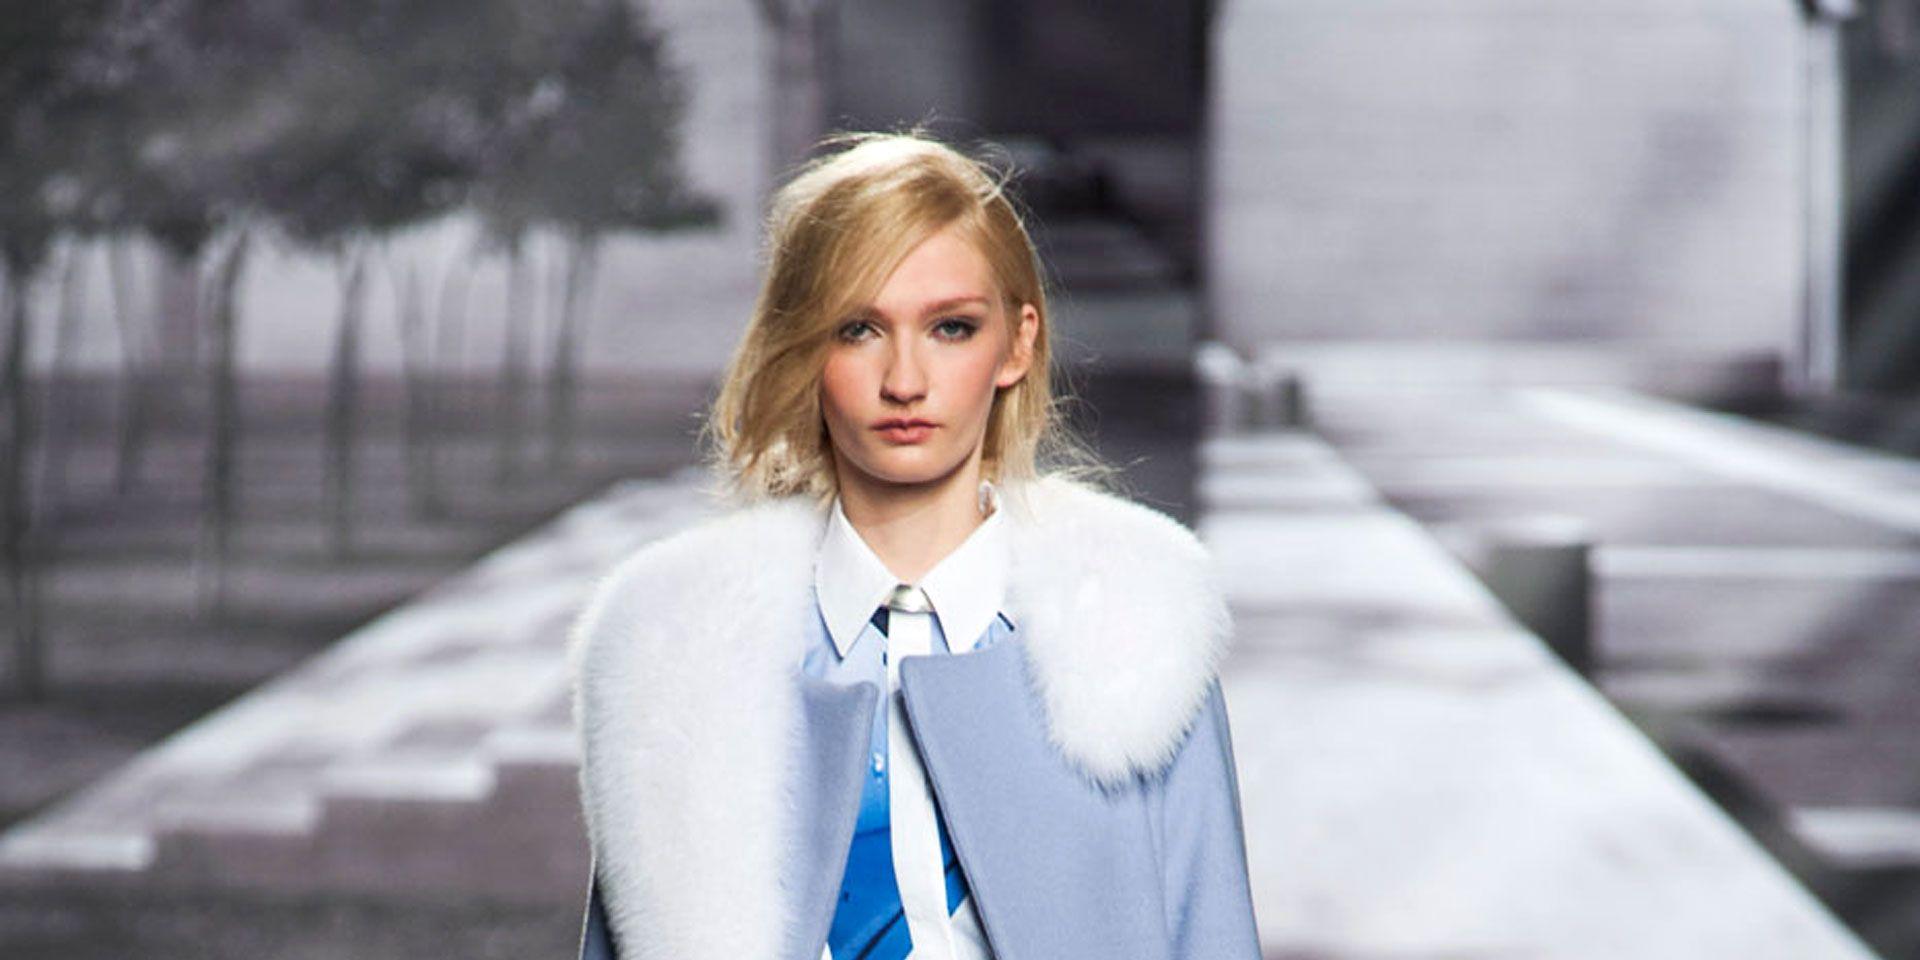 New York Fashion Week F/W 2014 Trend: Awesome Outerwear